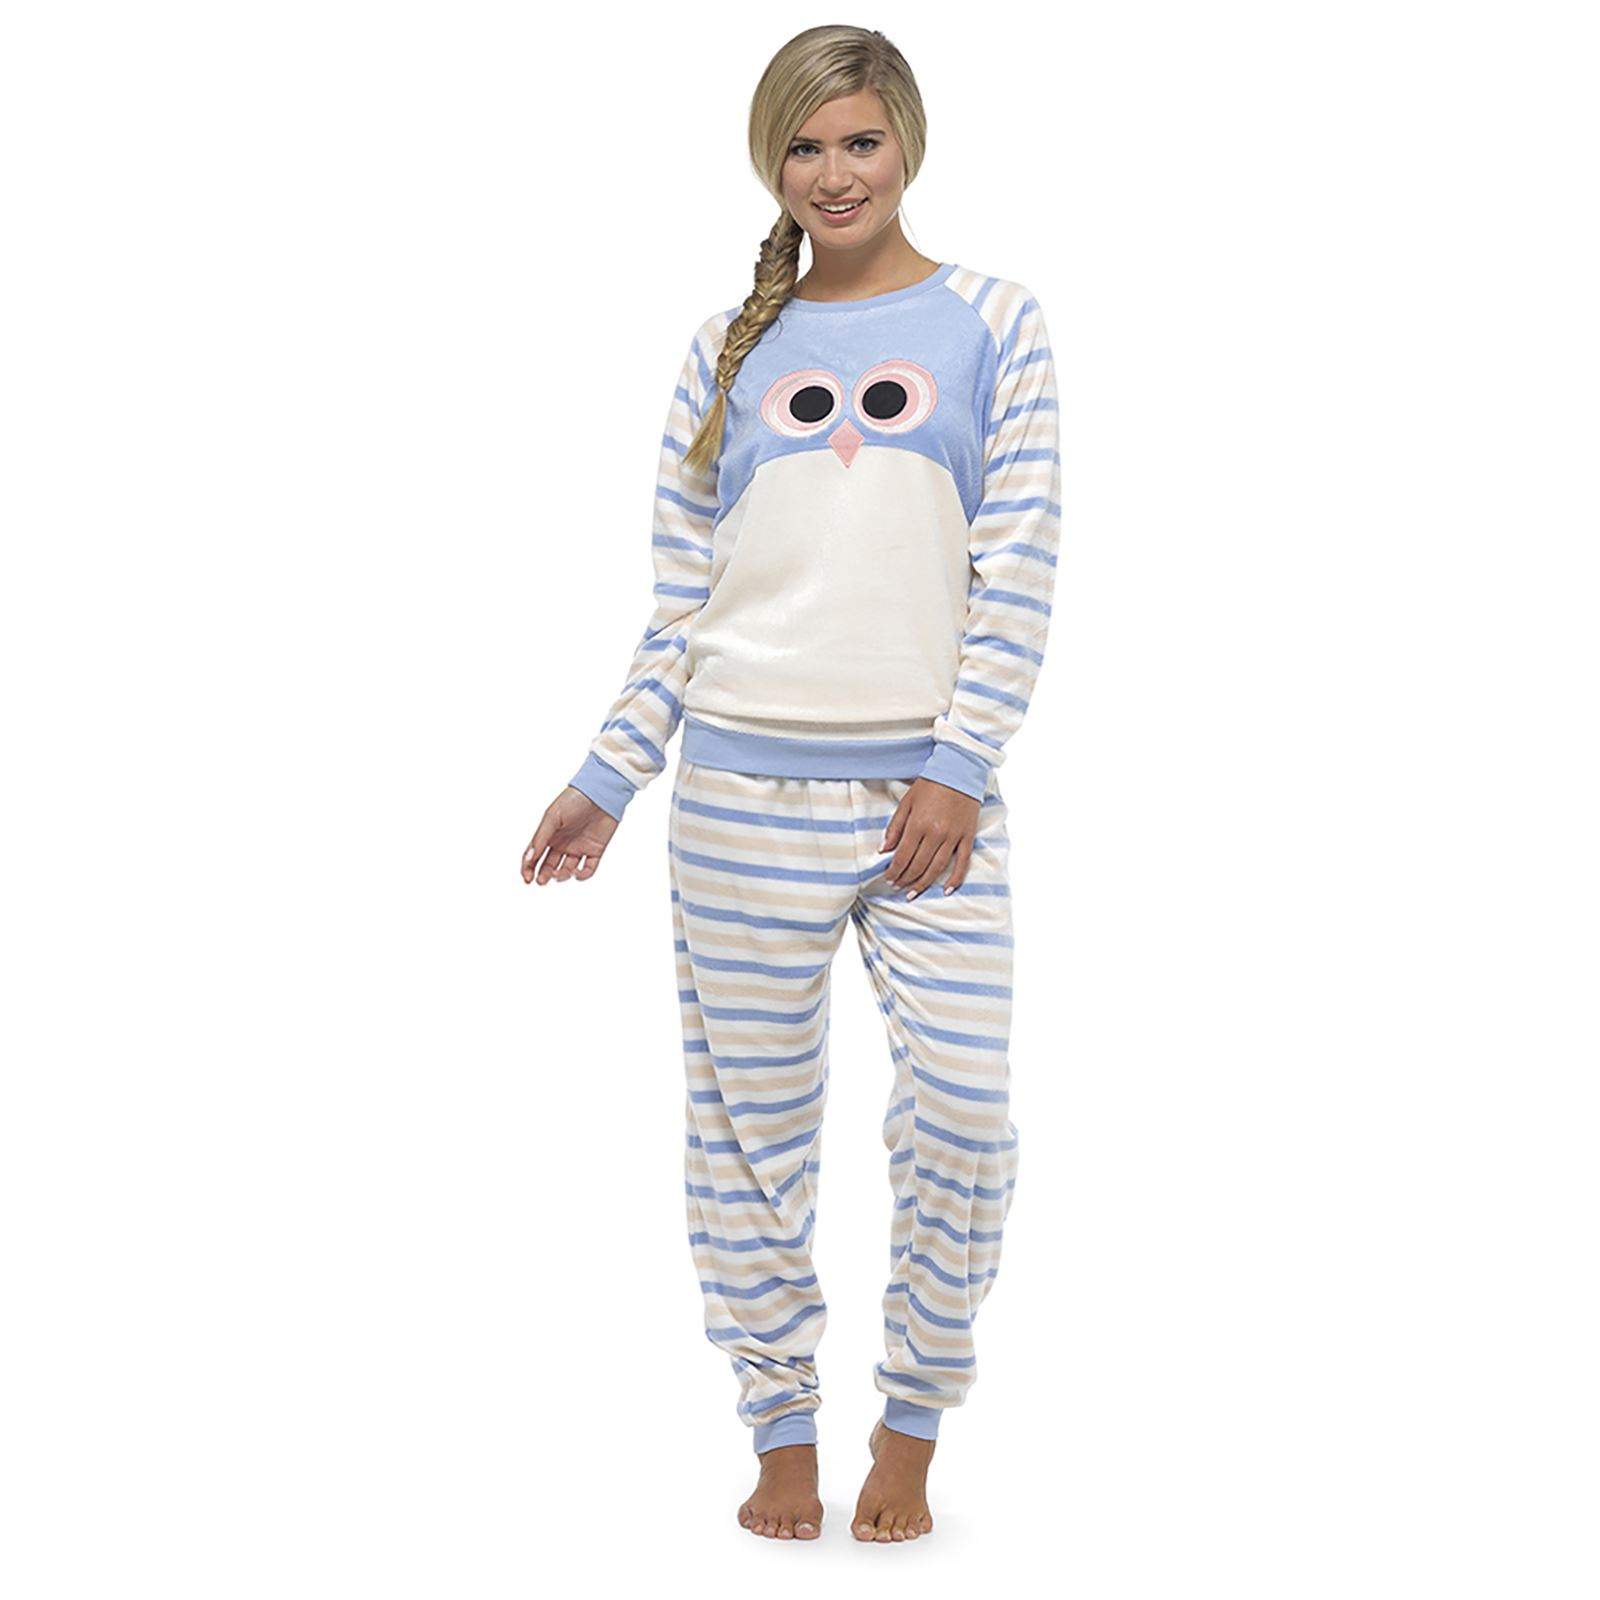 Foxbury Womens Animal Twosie Pyjama Set Top Bottoms Cosy Fleece Gift Pink//Blue